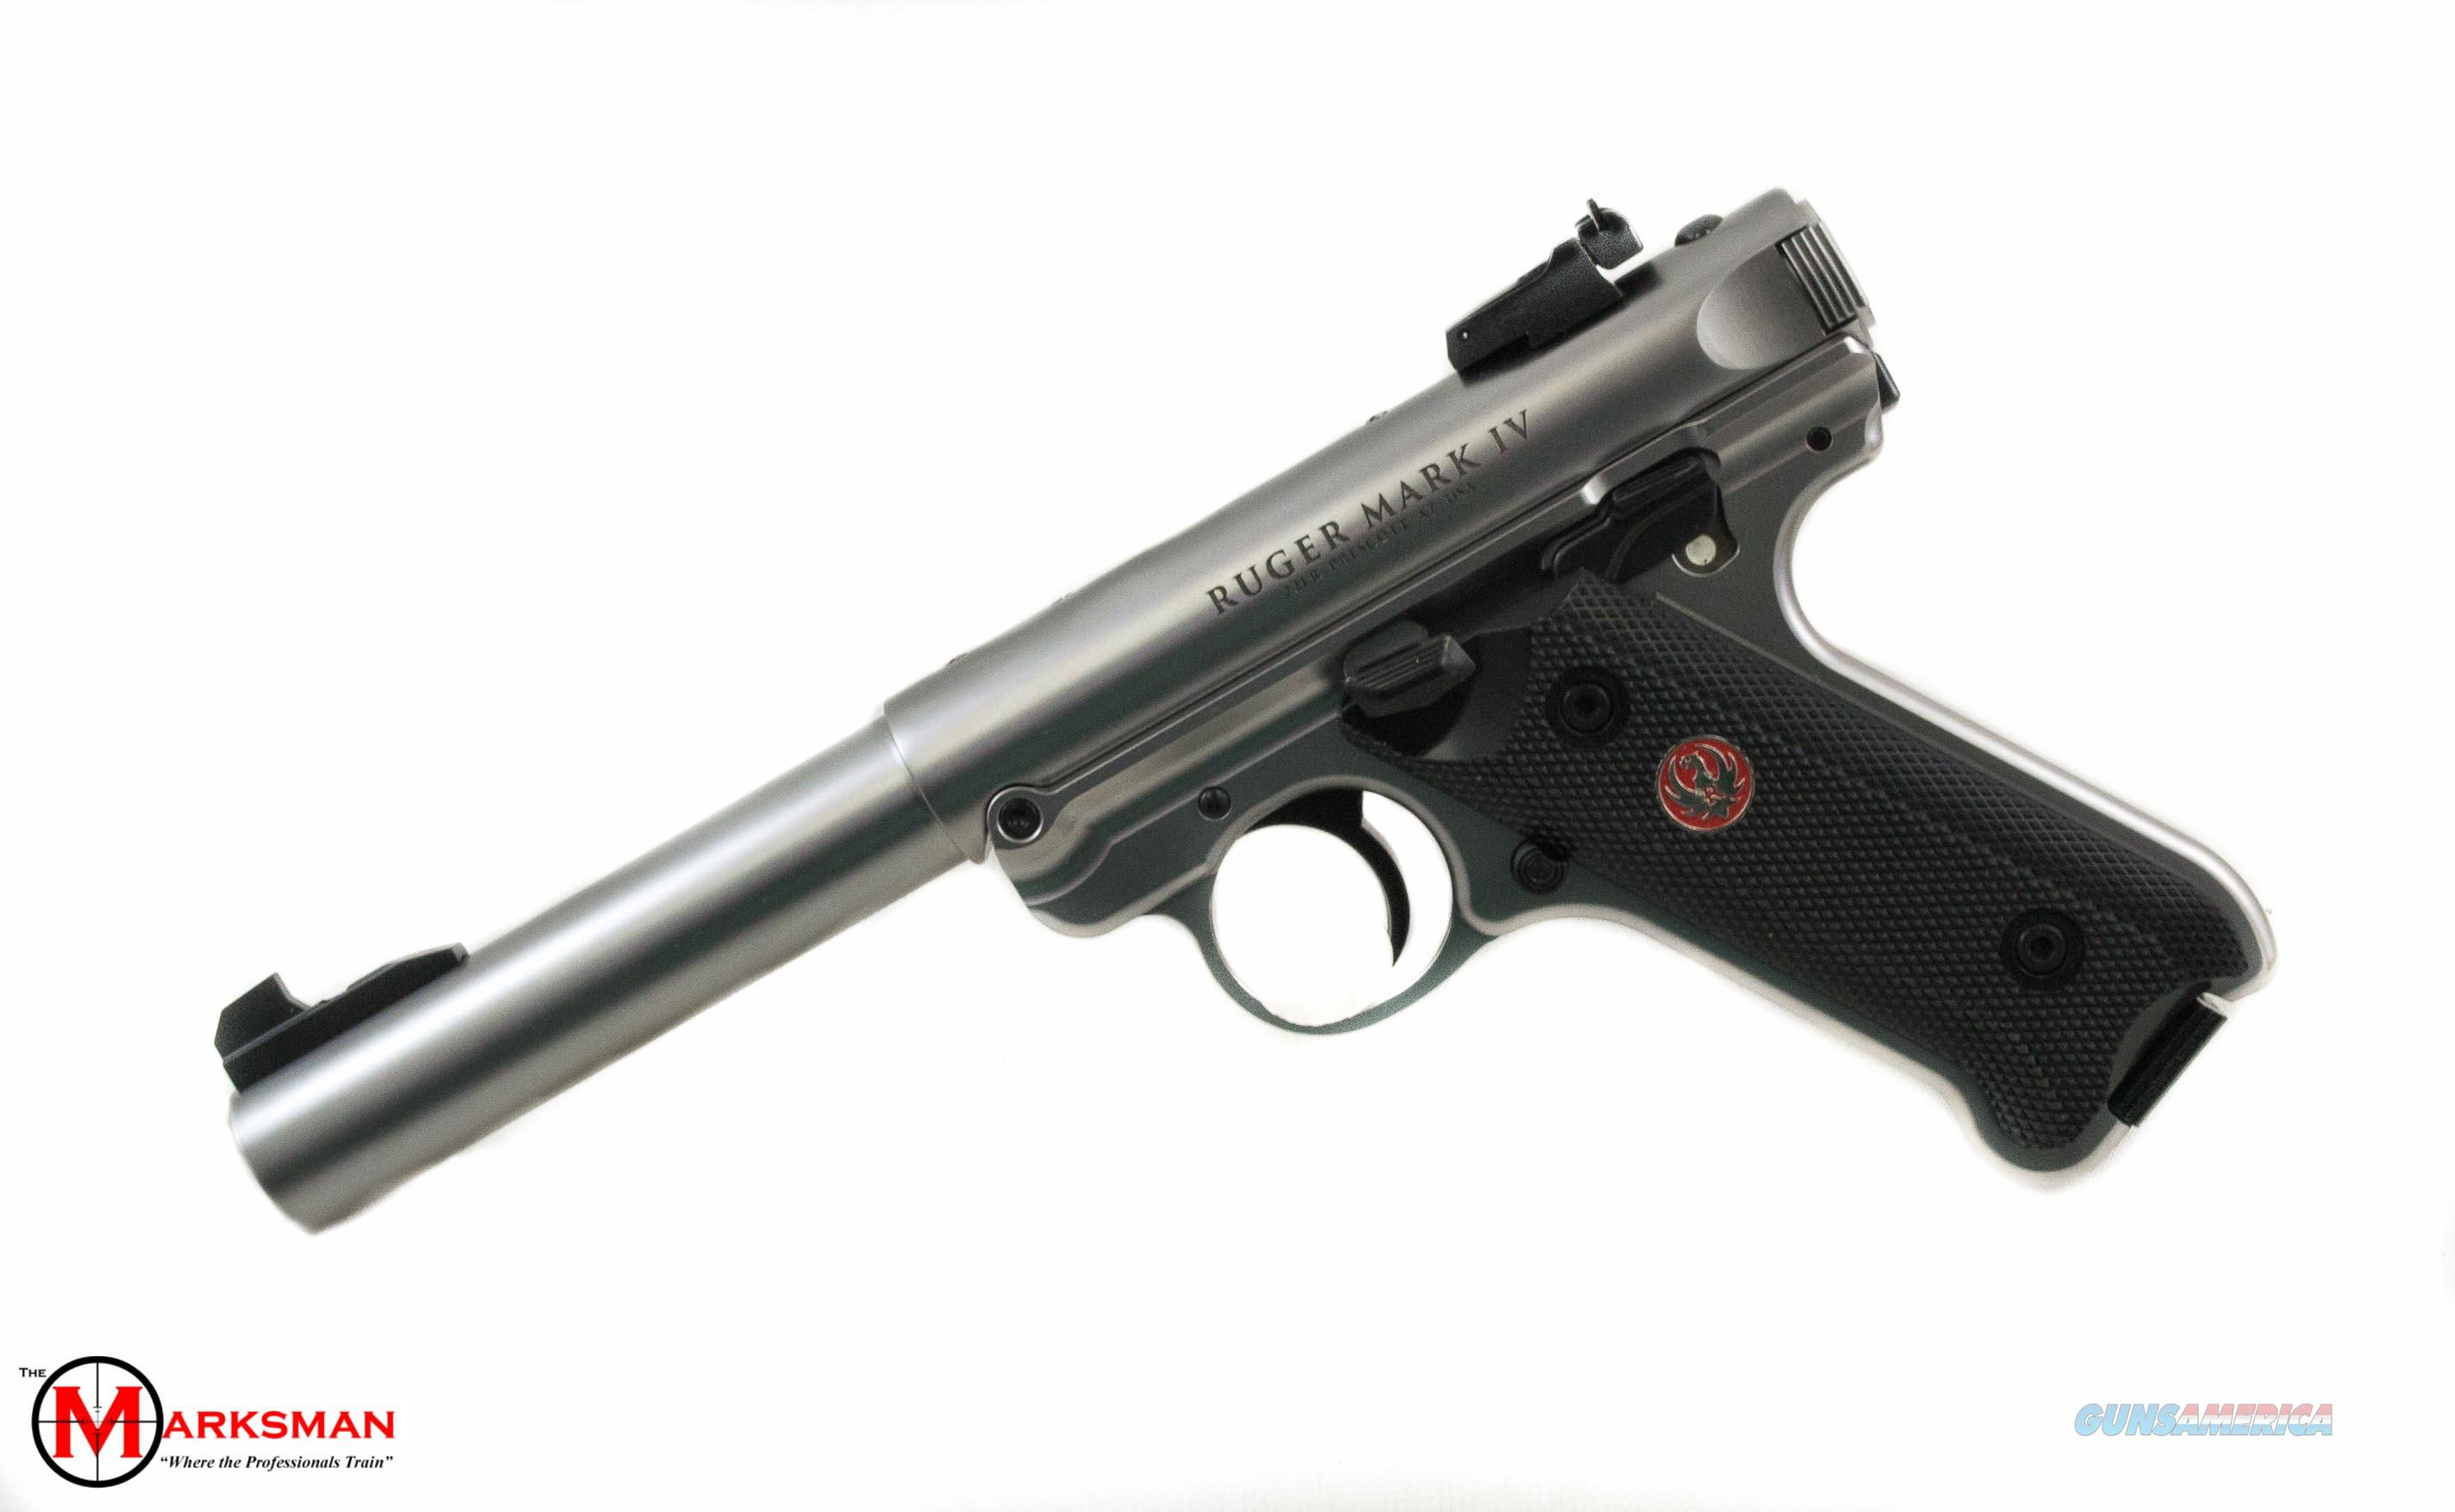 Ruger Mark IV Target .22 lr NEW 40103  Guns > Pistols > Ruger Semi-Auto Pistols > Mark I/II/III/IV Family